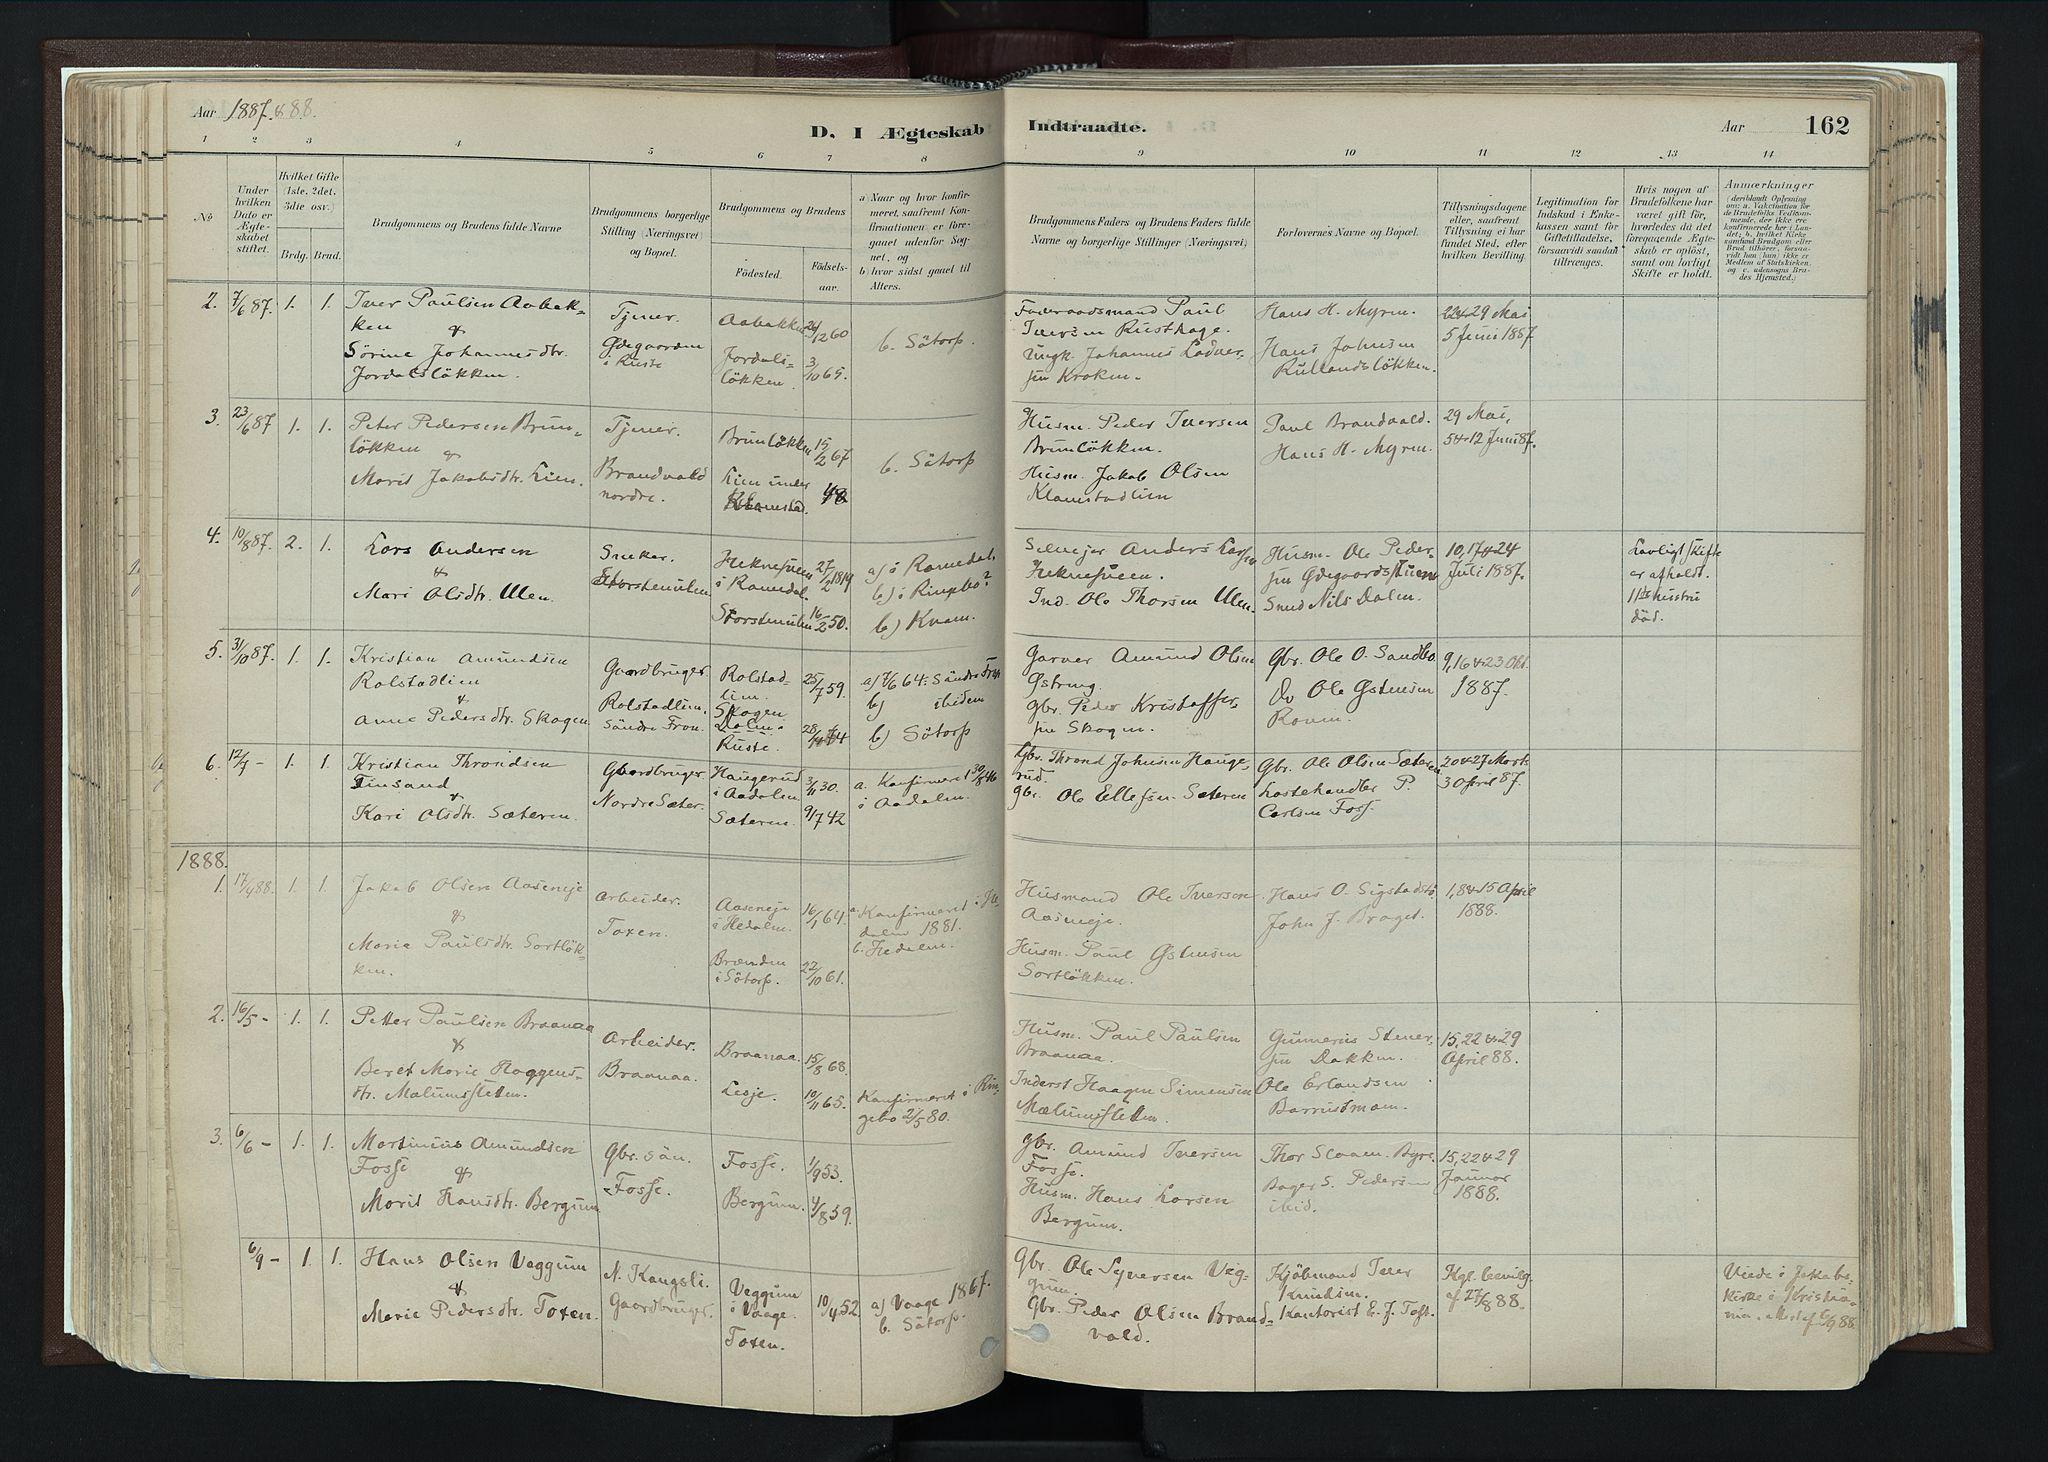 SAH, Nord-Fron prestekontor, Ministerialbok nr. 4, 1884-1914, s. 162